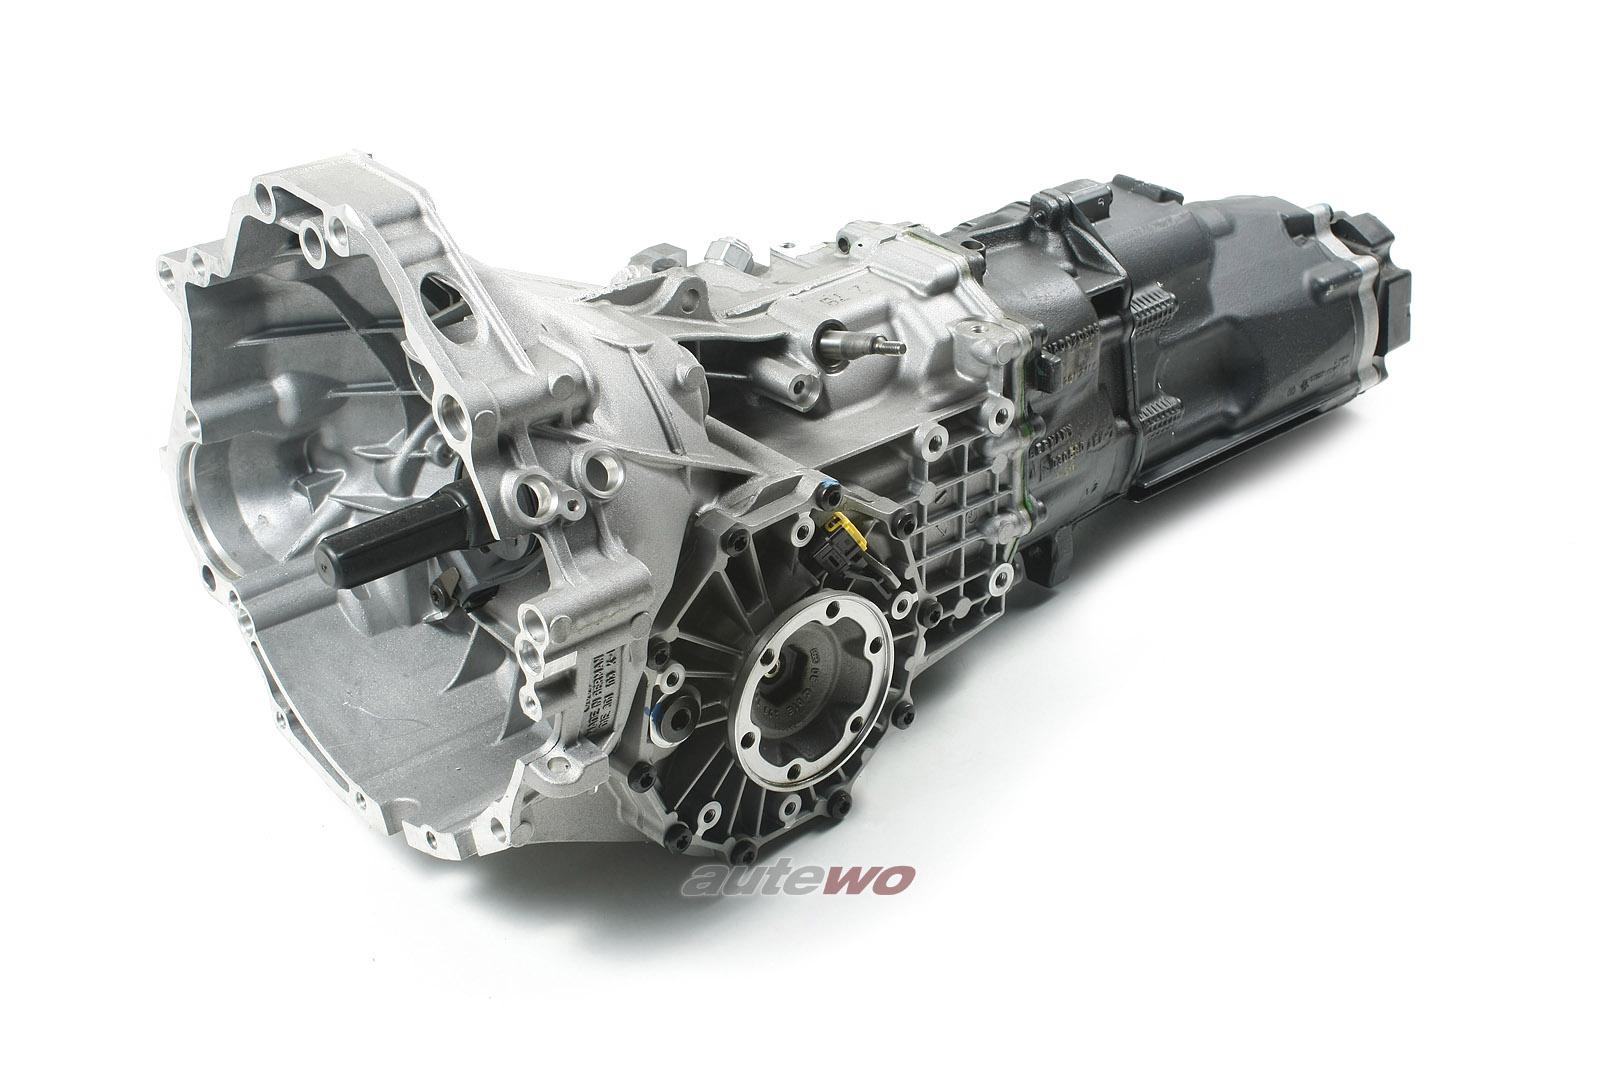 01e300044t Neu Audi S2 S4 S6 C4 Rs2 Urquattro 2 2l 6 Gang